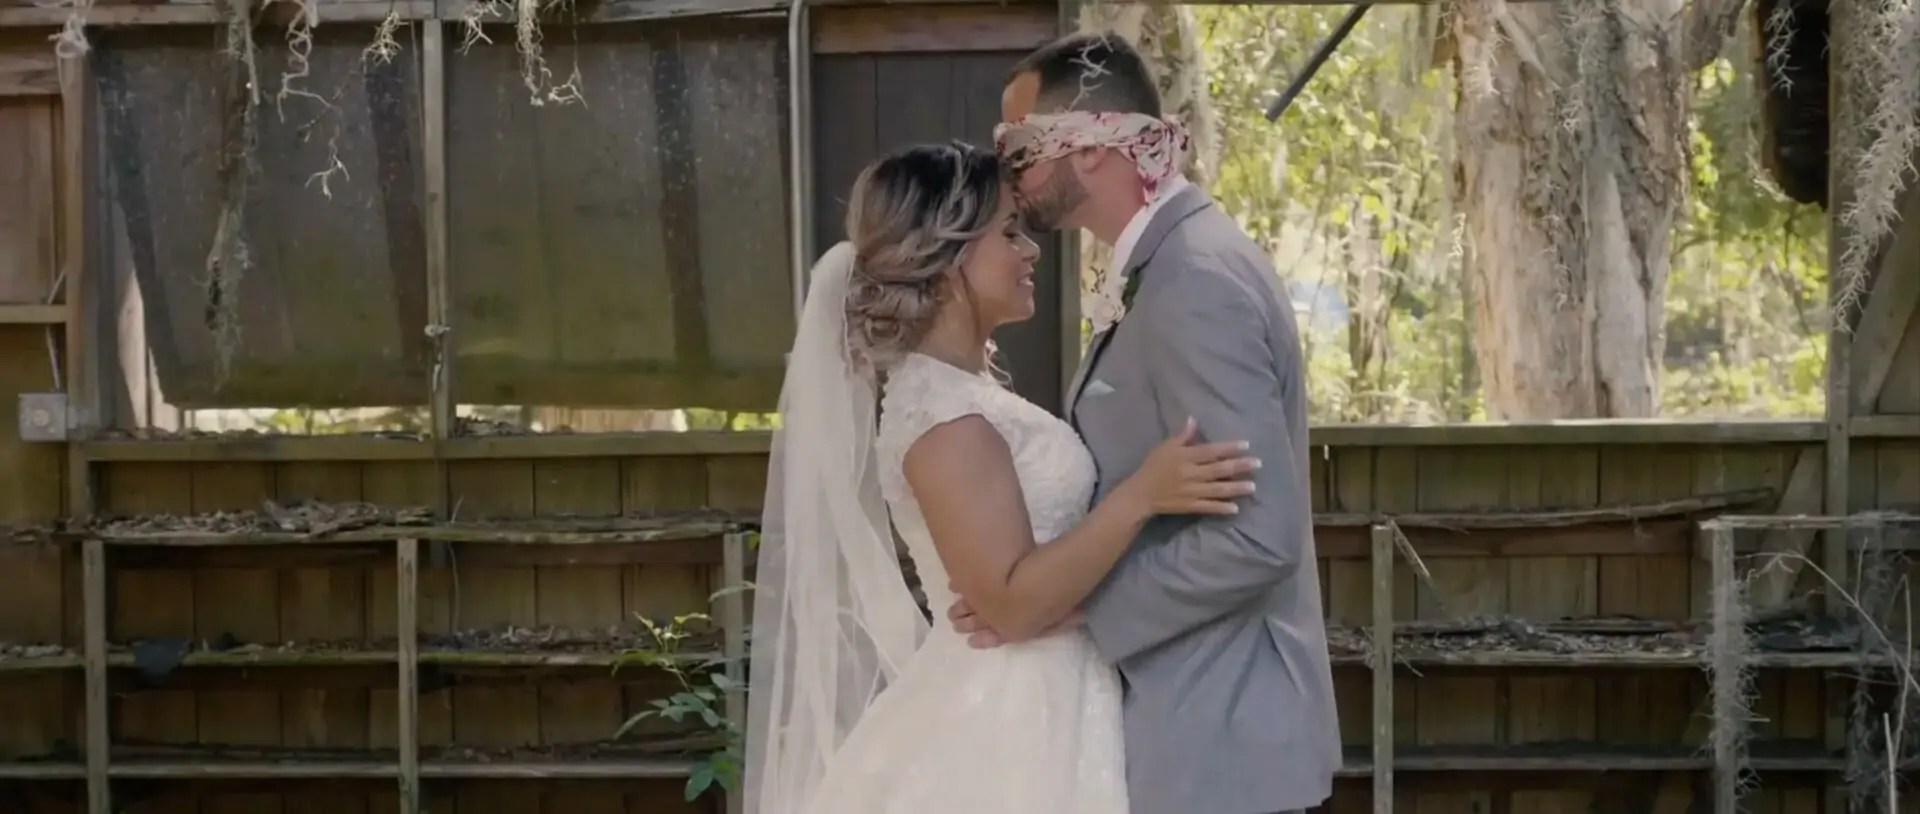 Maria & Matthew Wedding Film